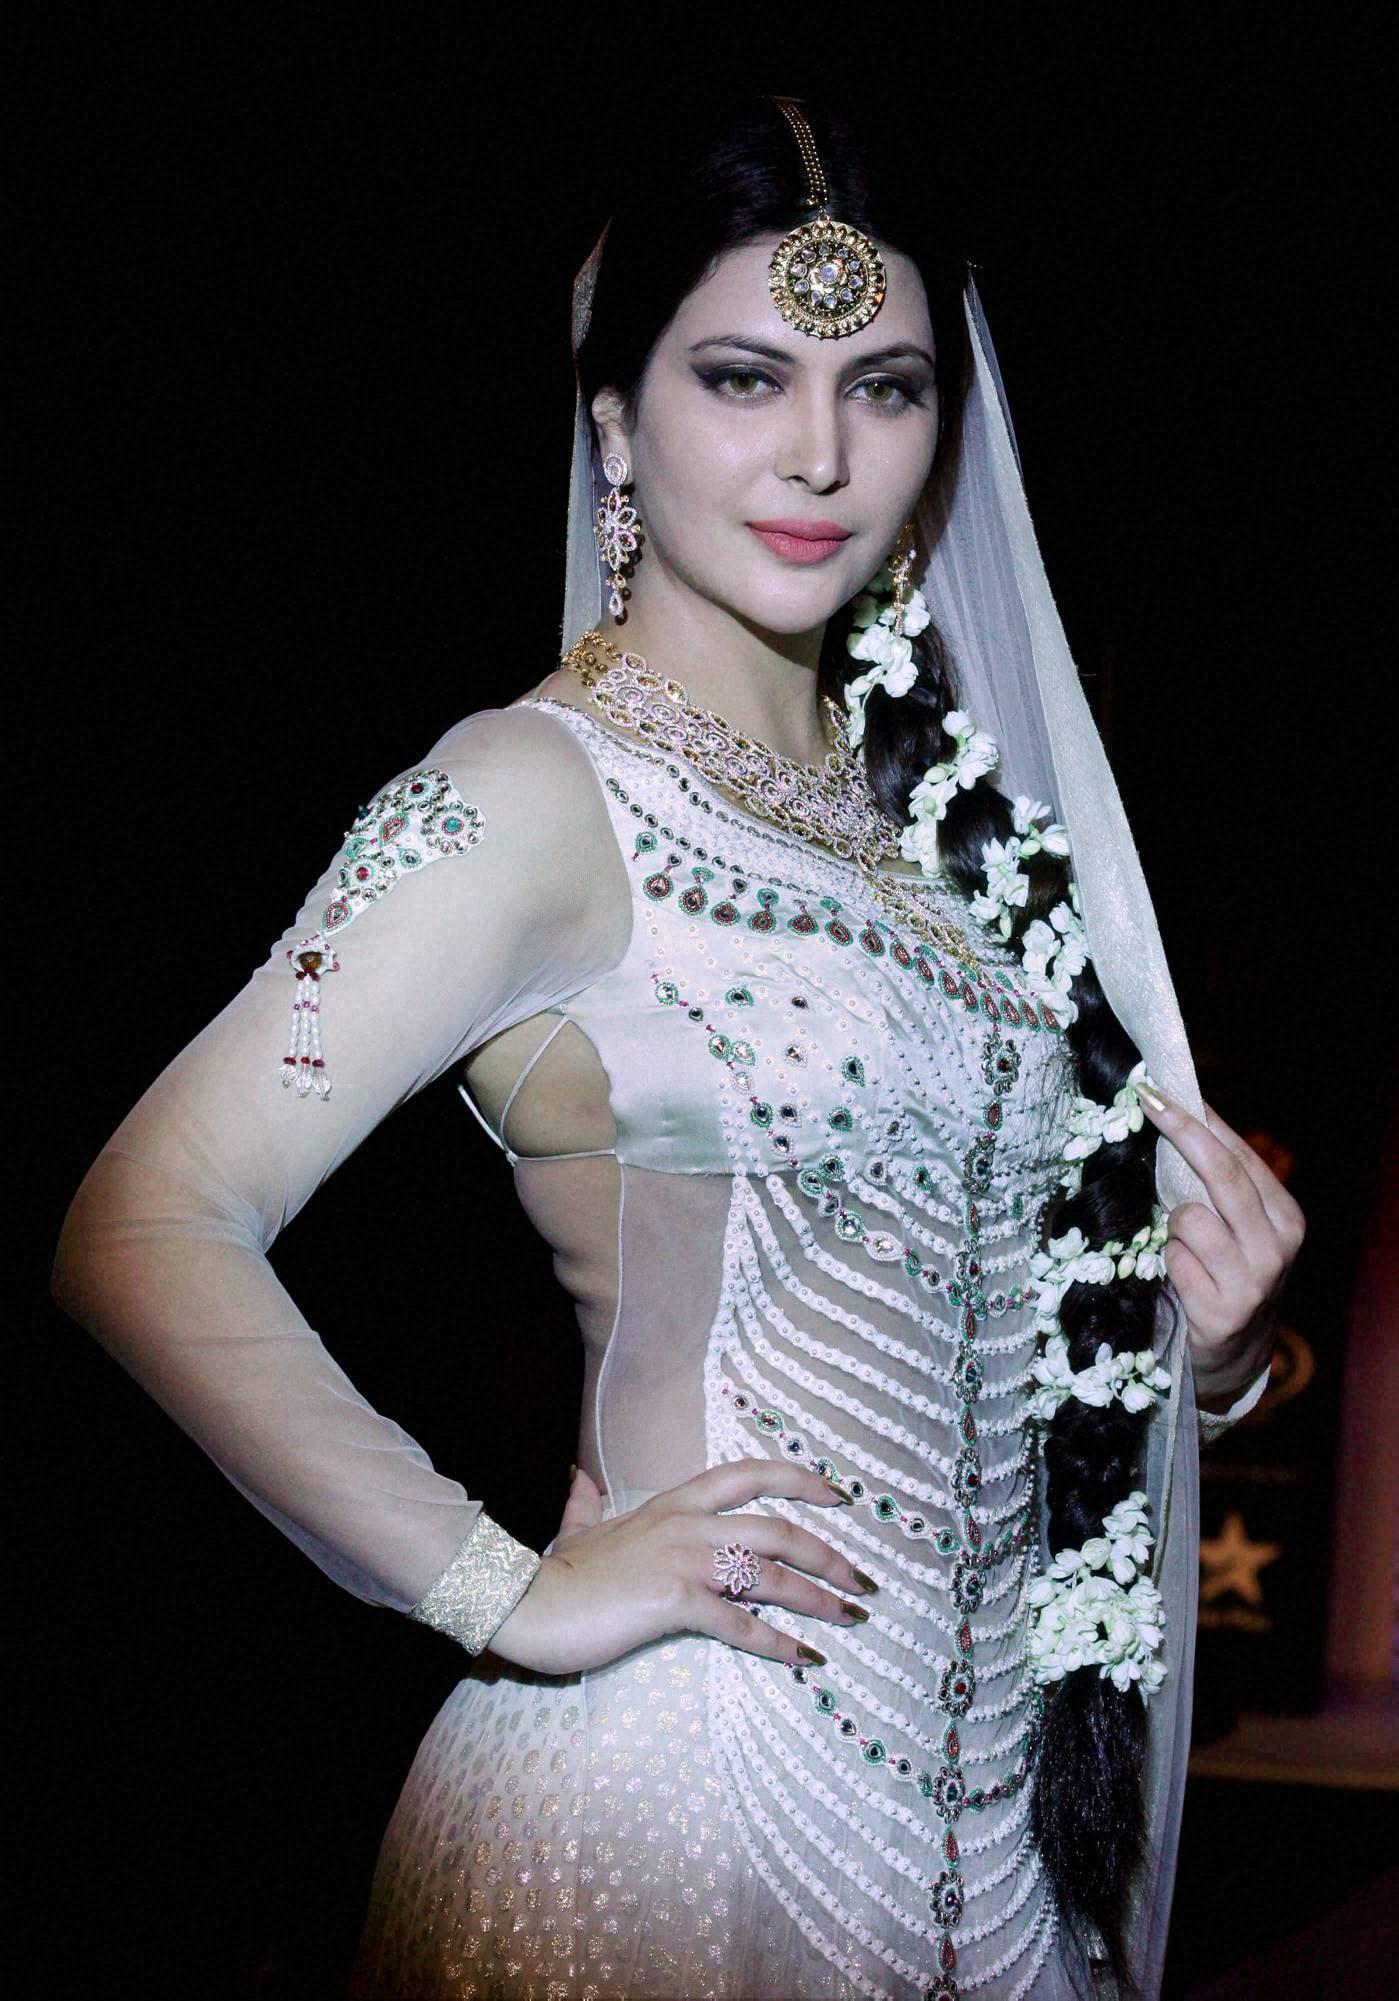 Former Miss India, Ankita Shorey, jewellery design, Queenie Singh, India, International, Jewellery Week, Mumbai